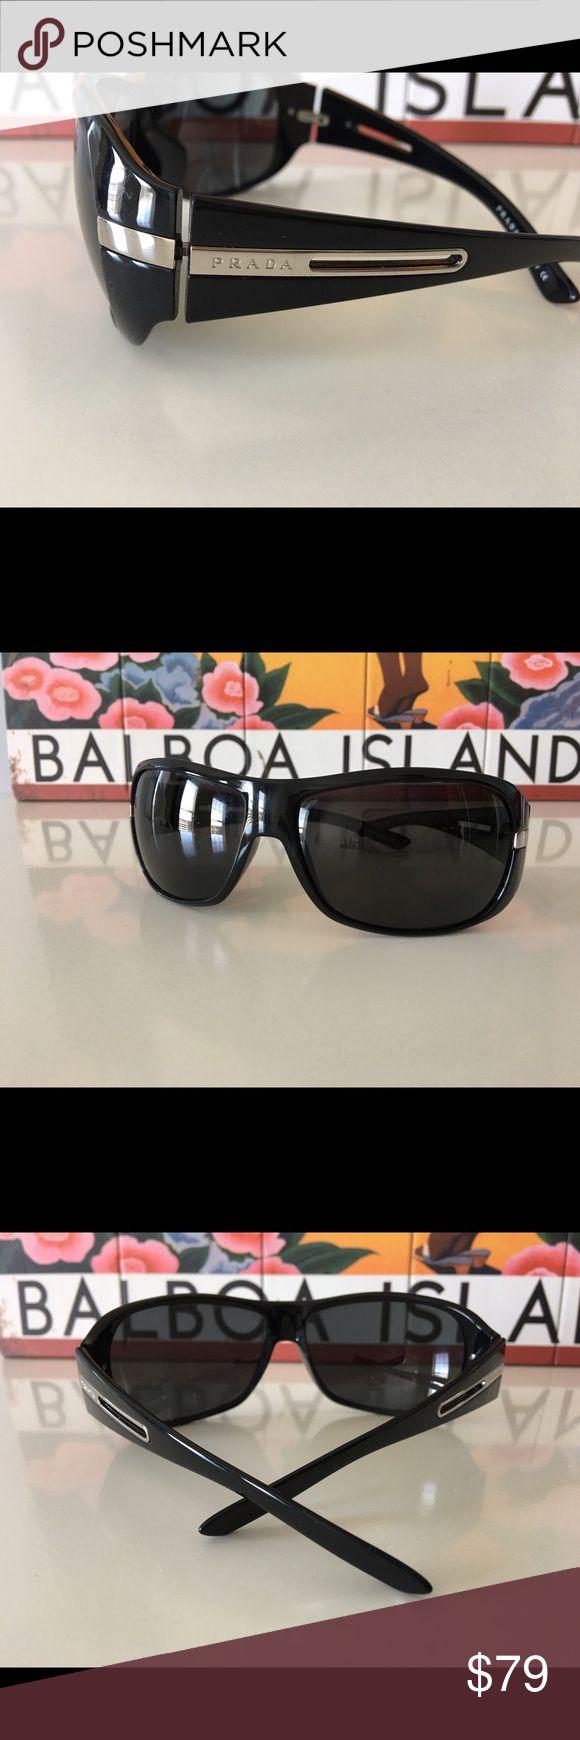 Black Prada Sunglasses All black, rounded rectangle lense Diva sunnies with silver Prada post. Prada Accessories Sunglasses